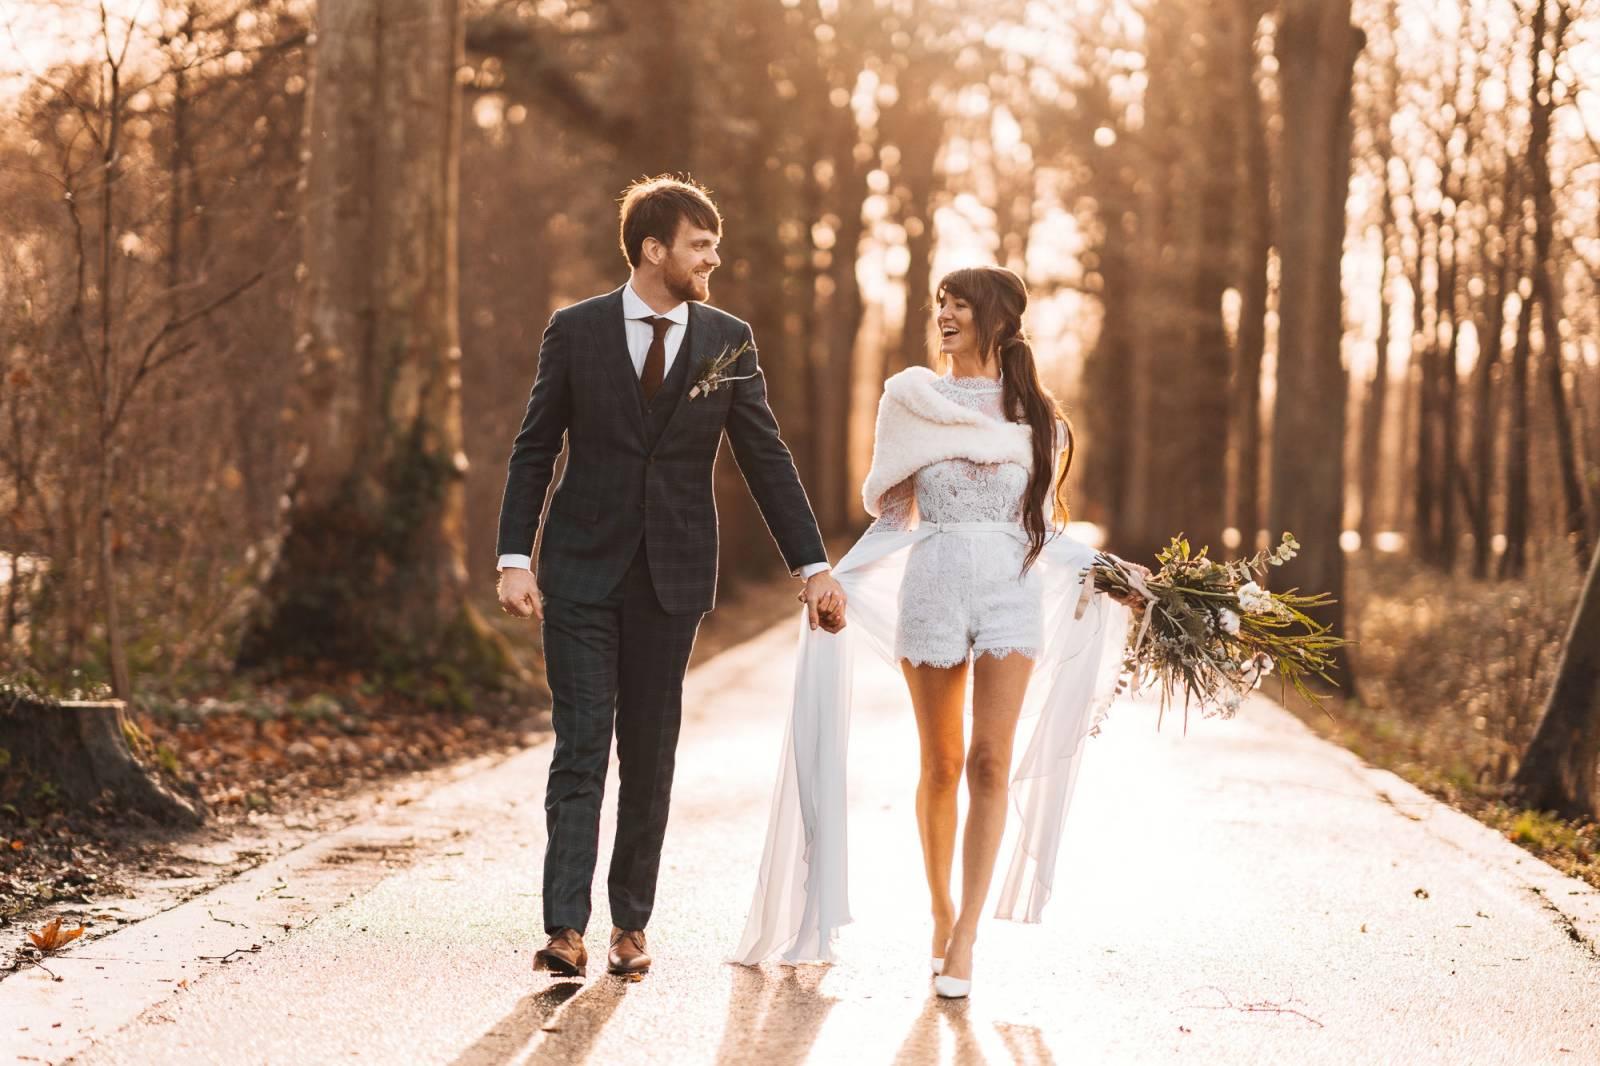 Alex VDB - House of Weddings - 16